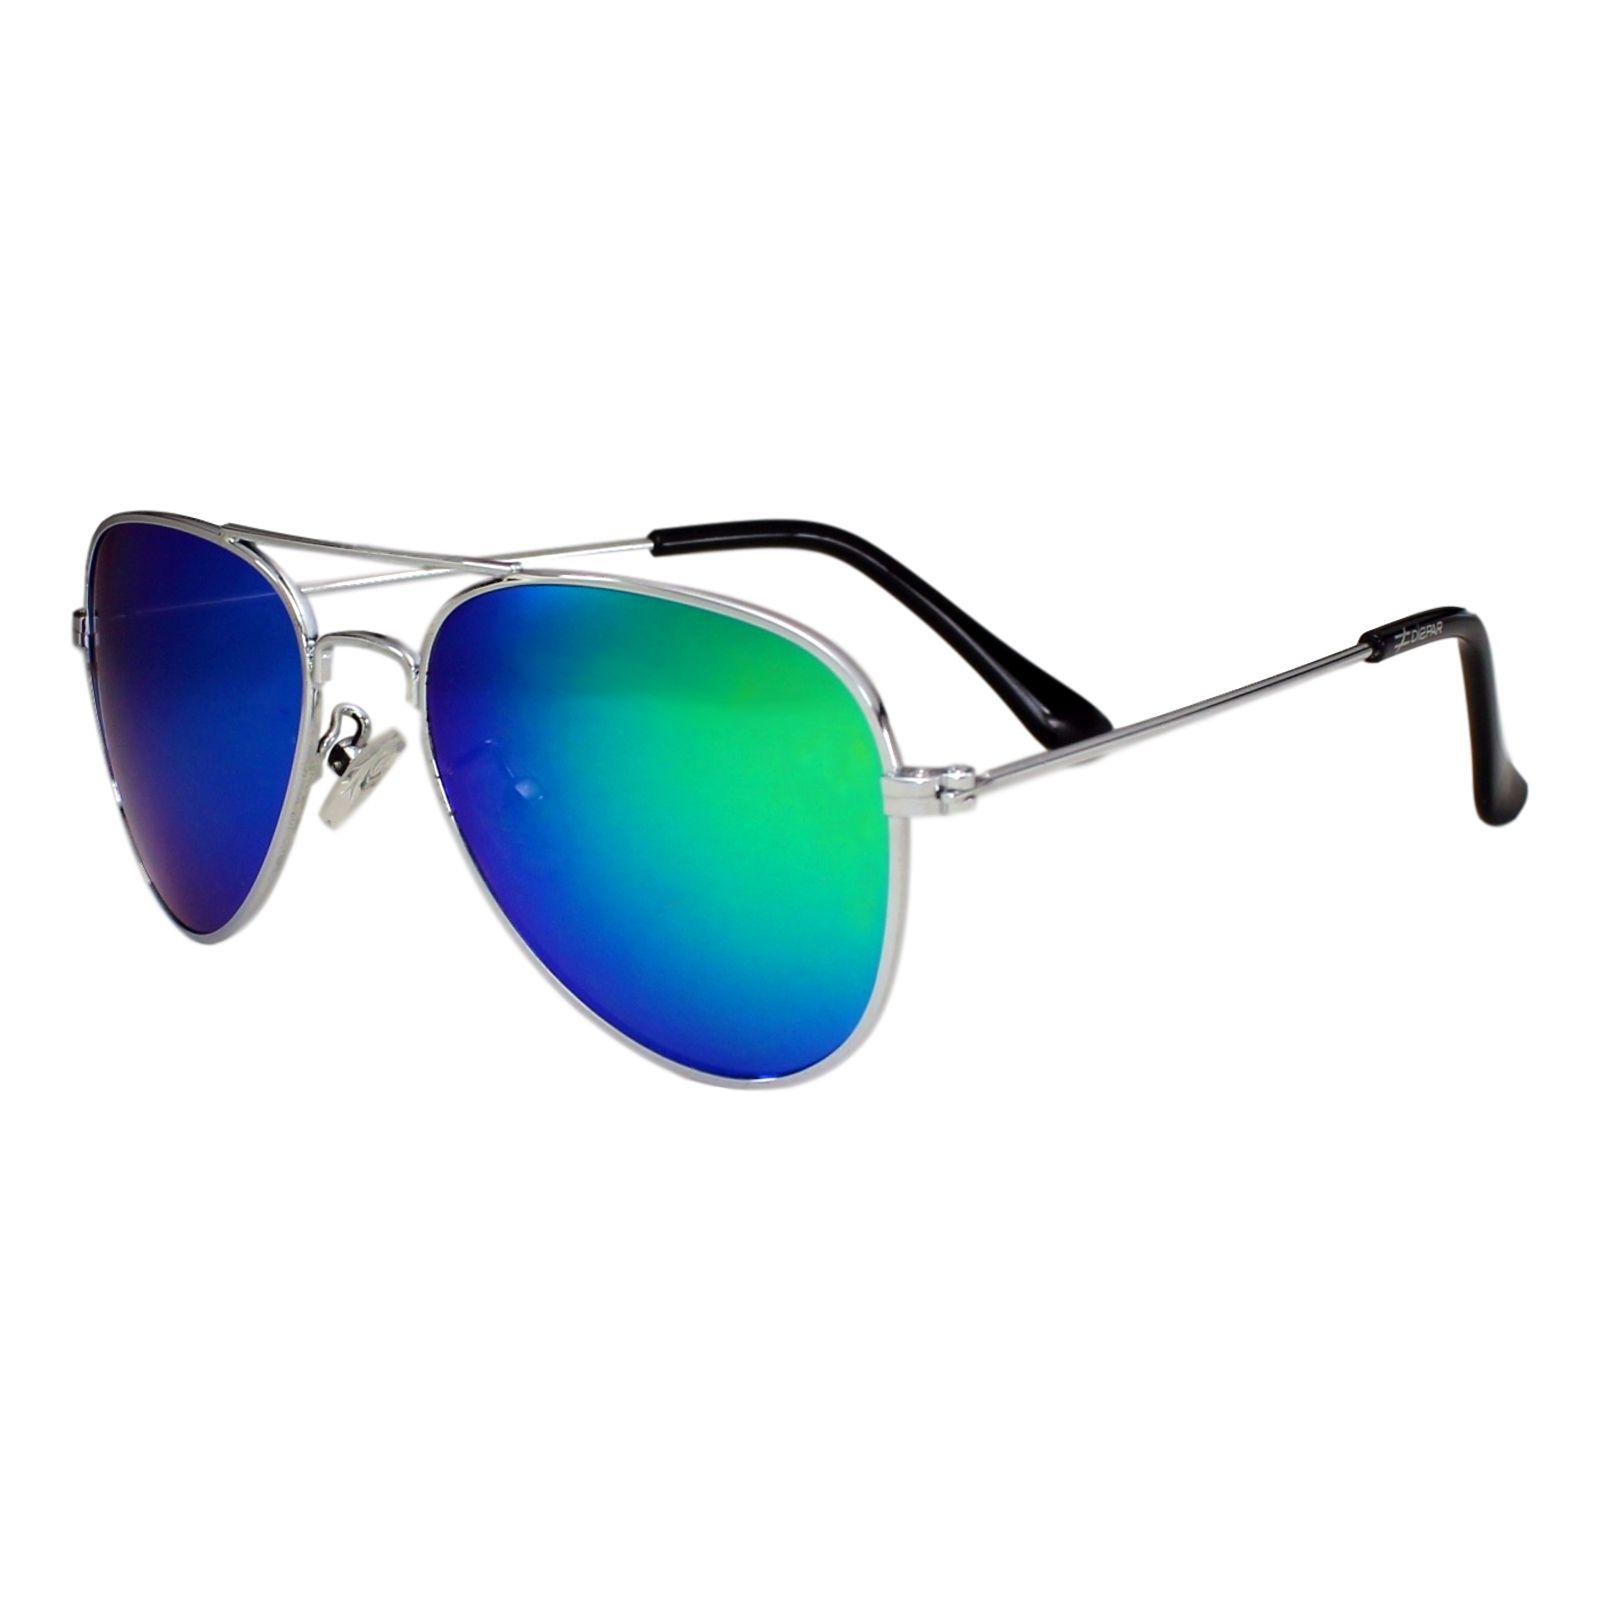 Óculos de Sol Díspar ID1744 infantil - Verde